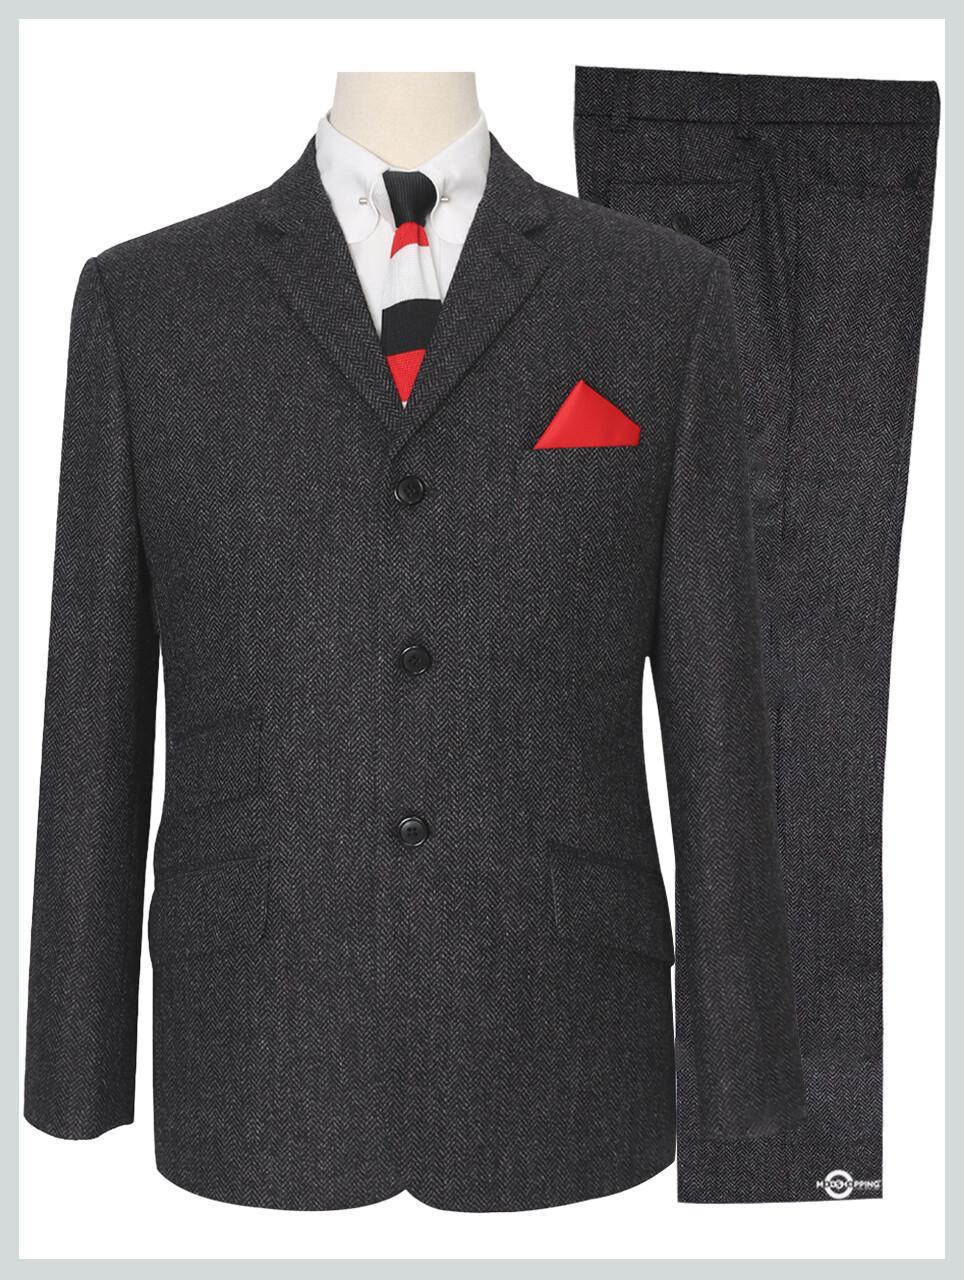 Mod Tweed Suit | Charcoal Grey 3 Button Suit